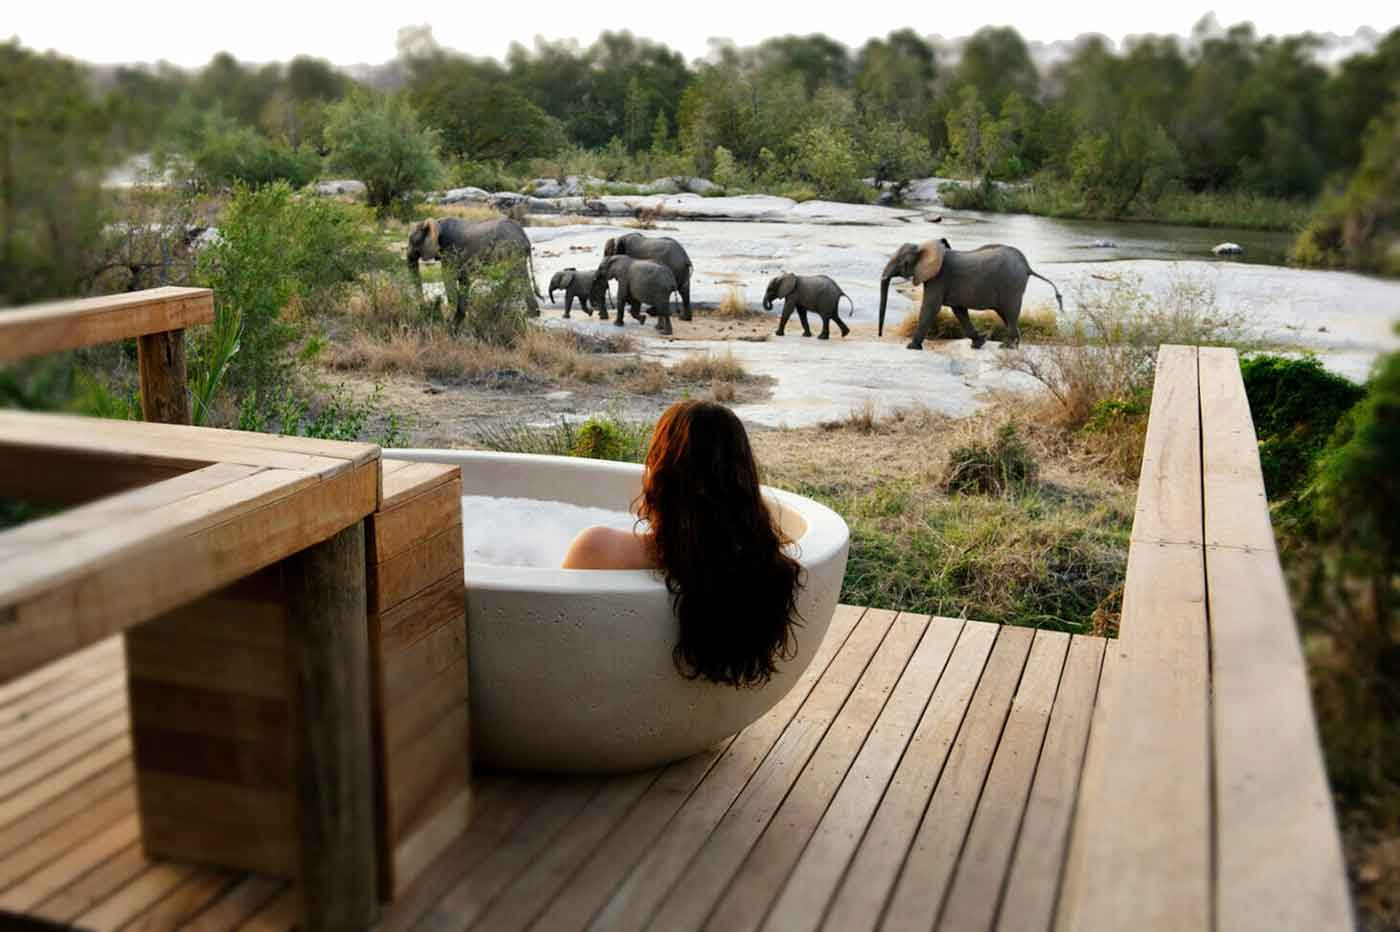 Londolozi Elephants